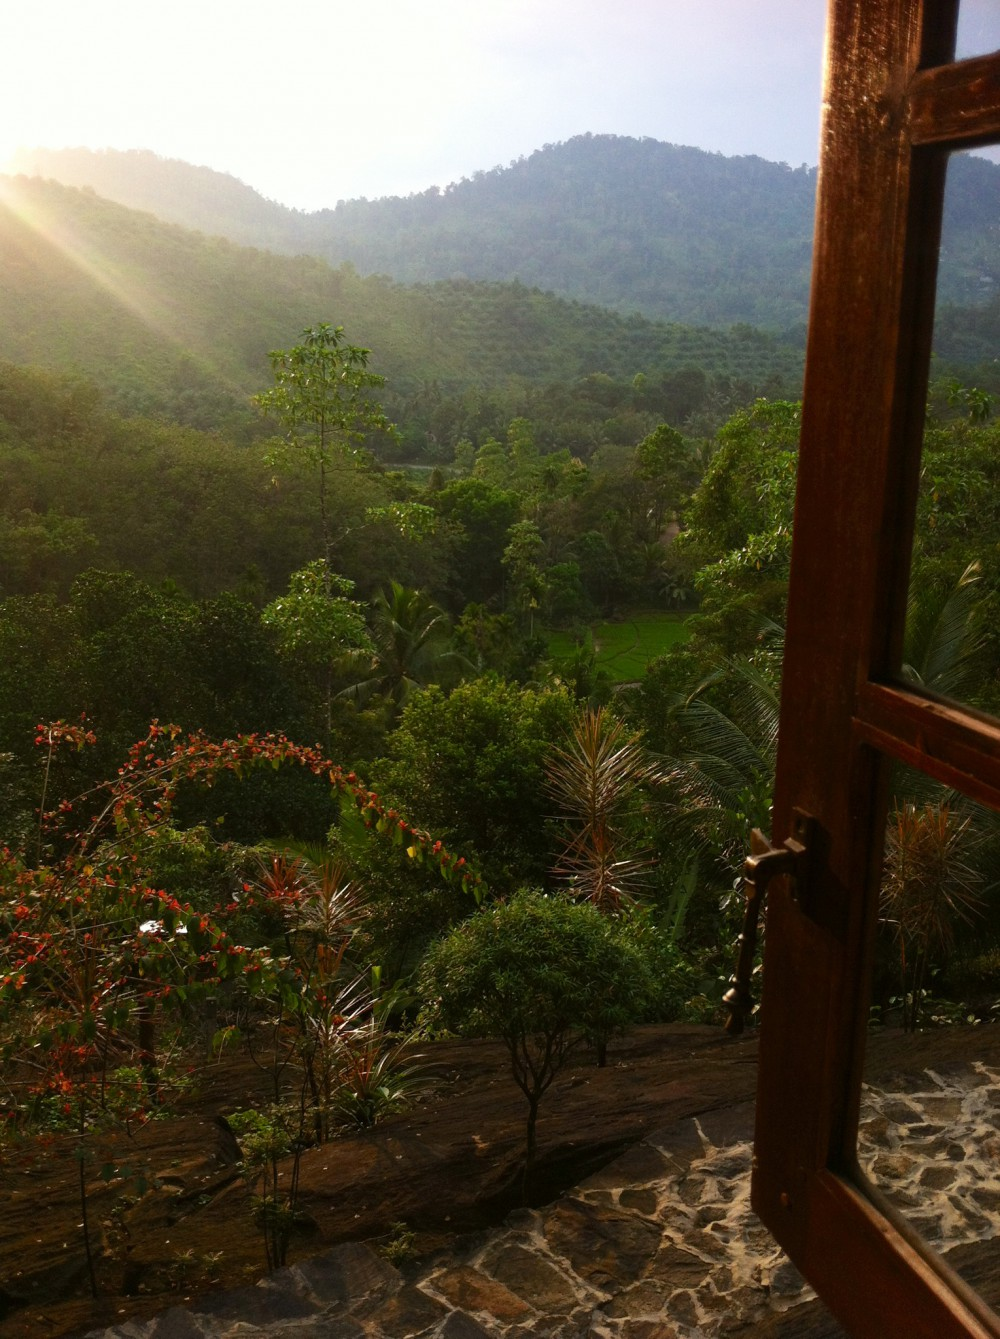 Blick_aus_dem Fenster_Singharaja_Garden_Eco_Lodge